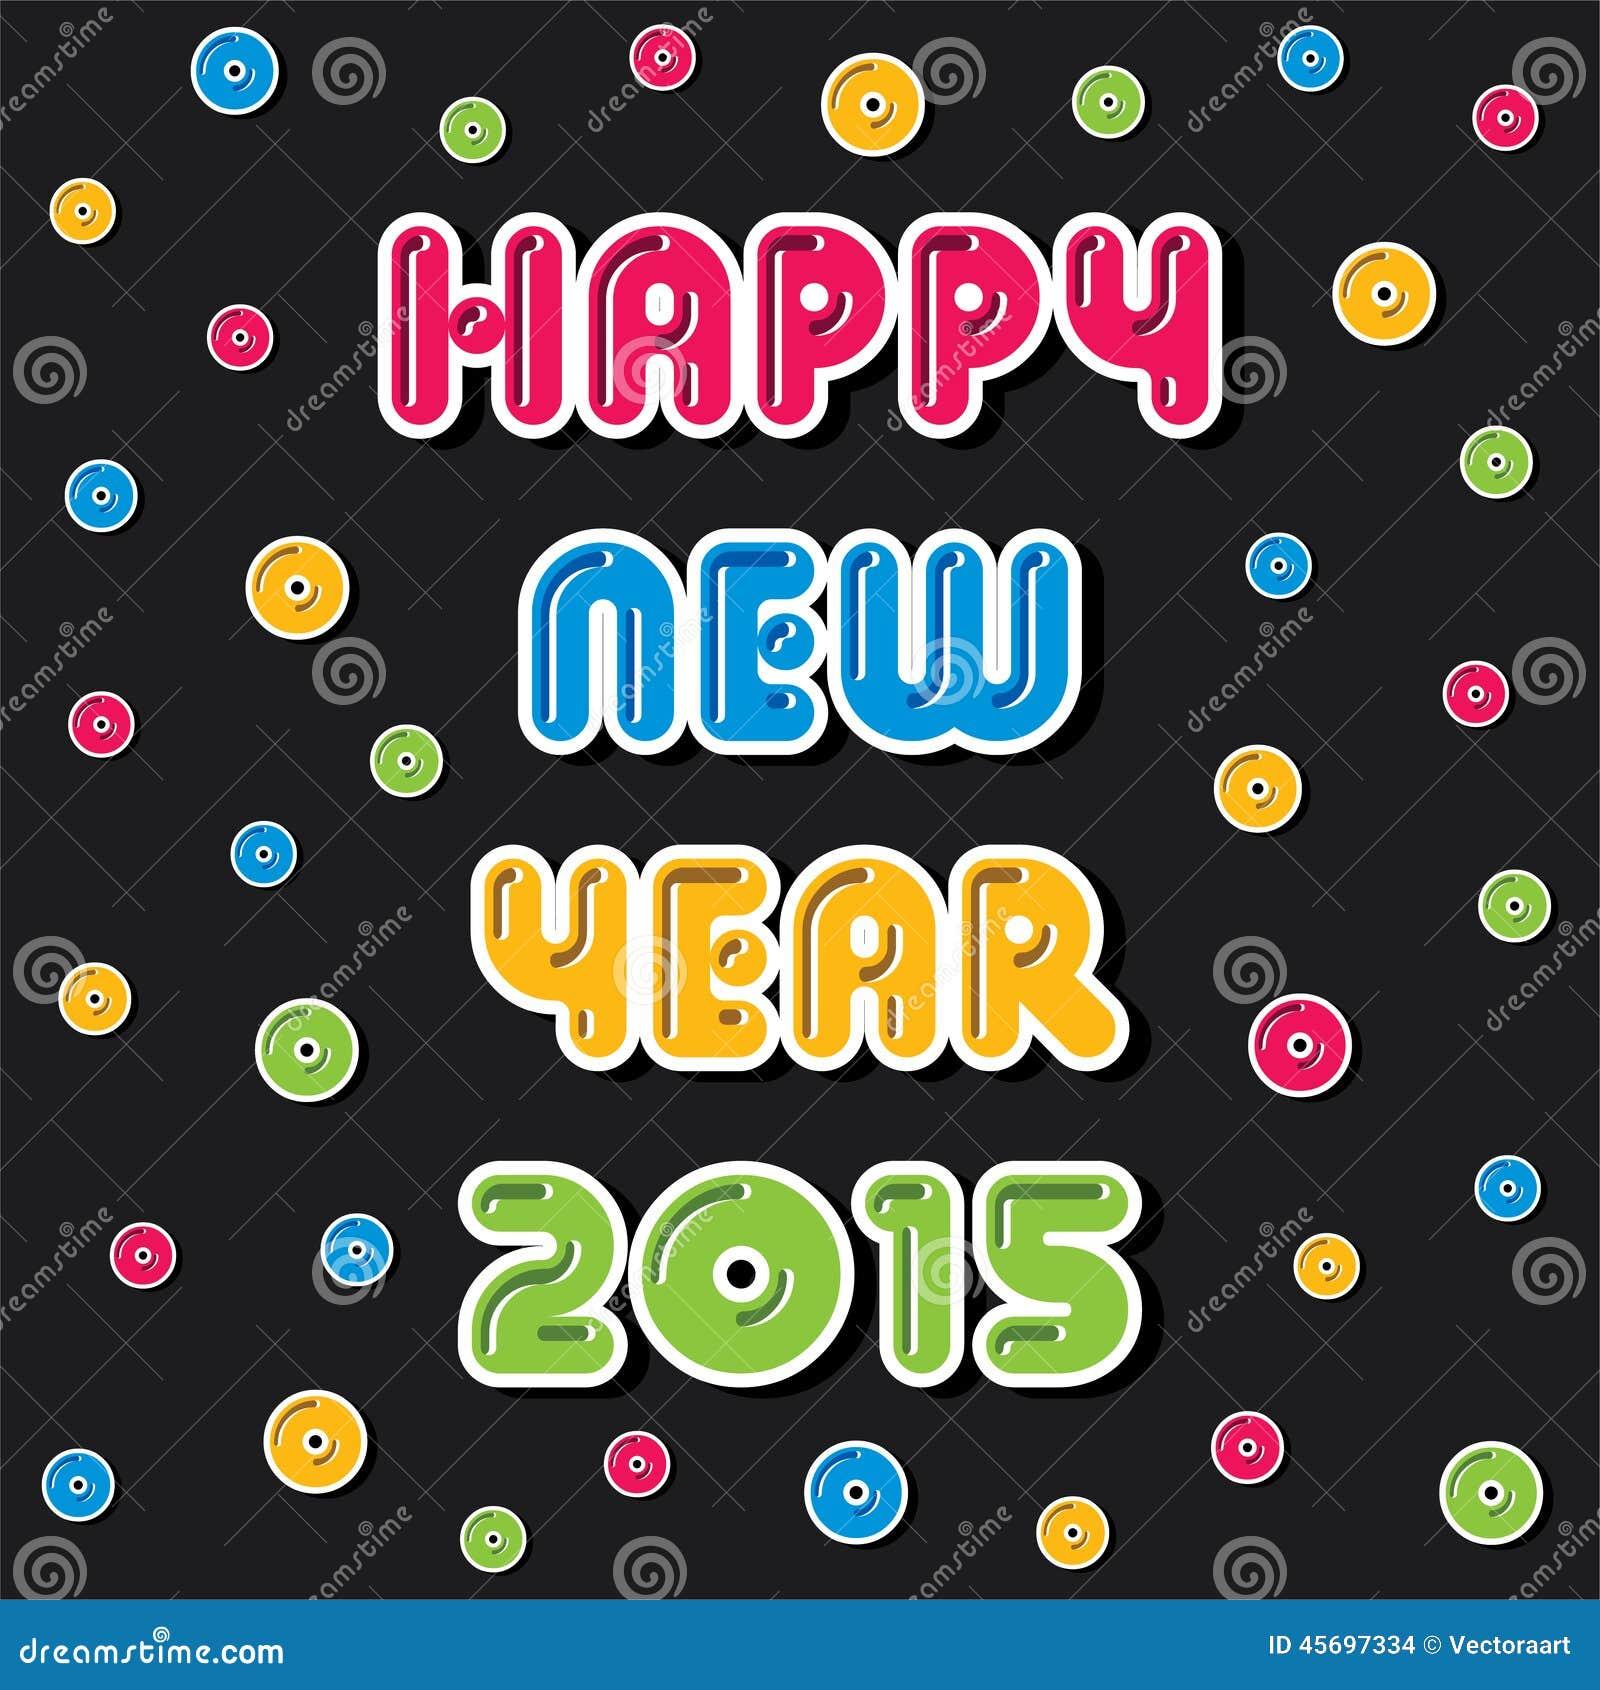 Creative Happy New Year 2015 Greeting Design Stock Vector